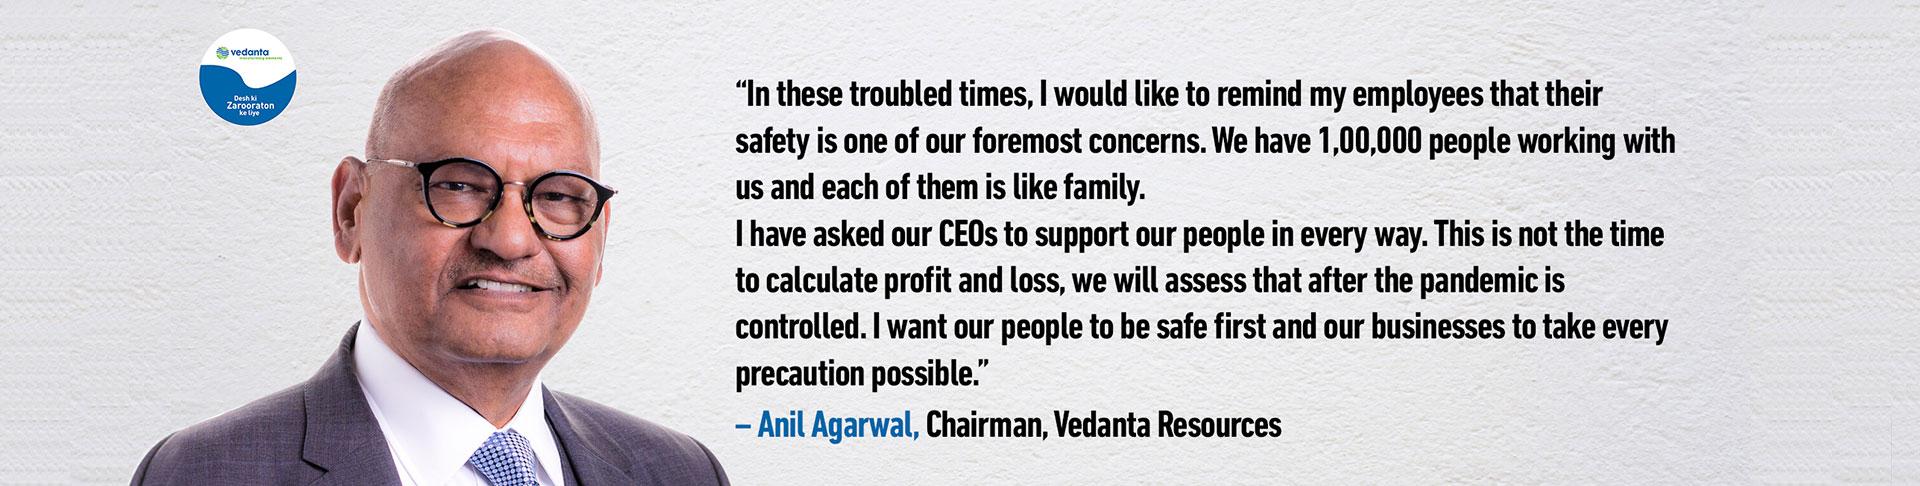 Vedanta-Resources-Chairman-quote